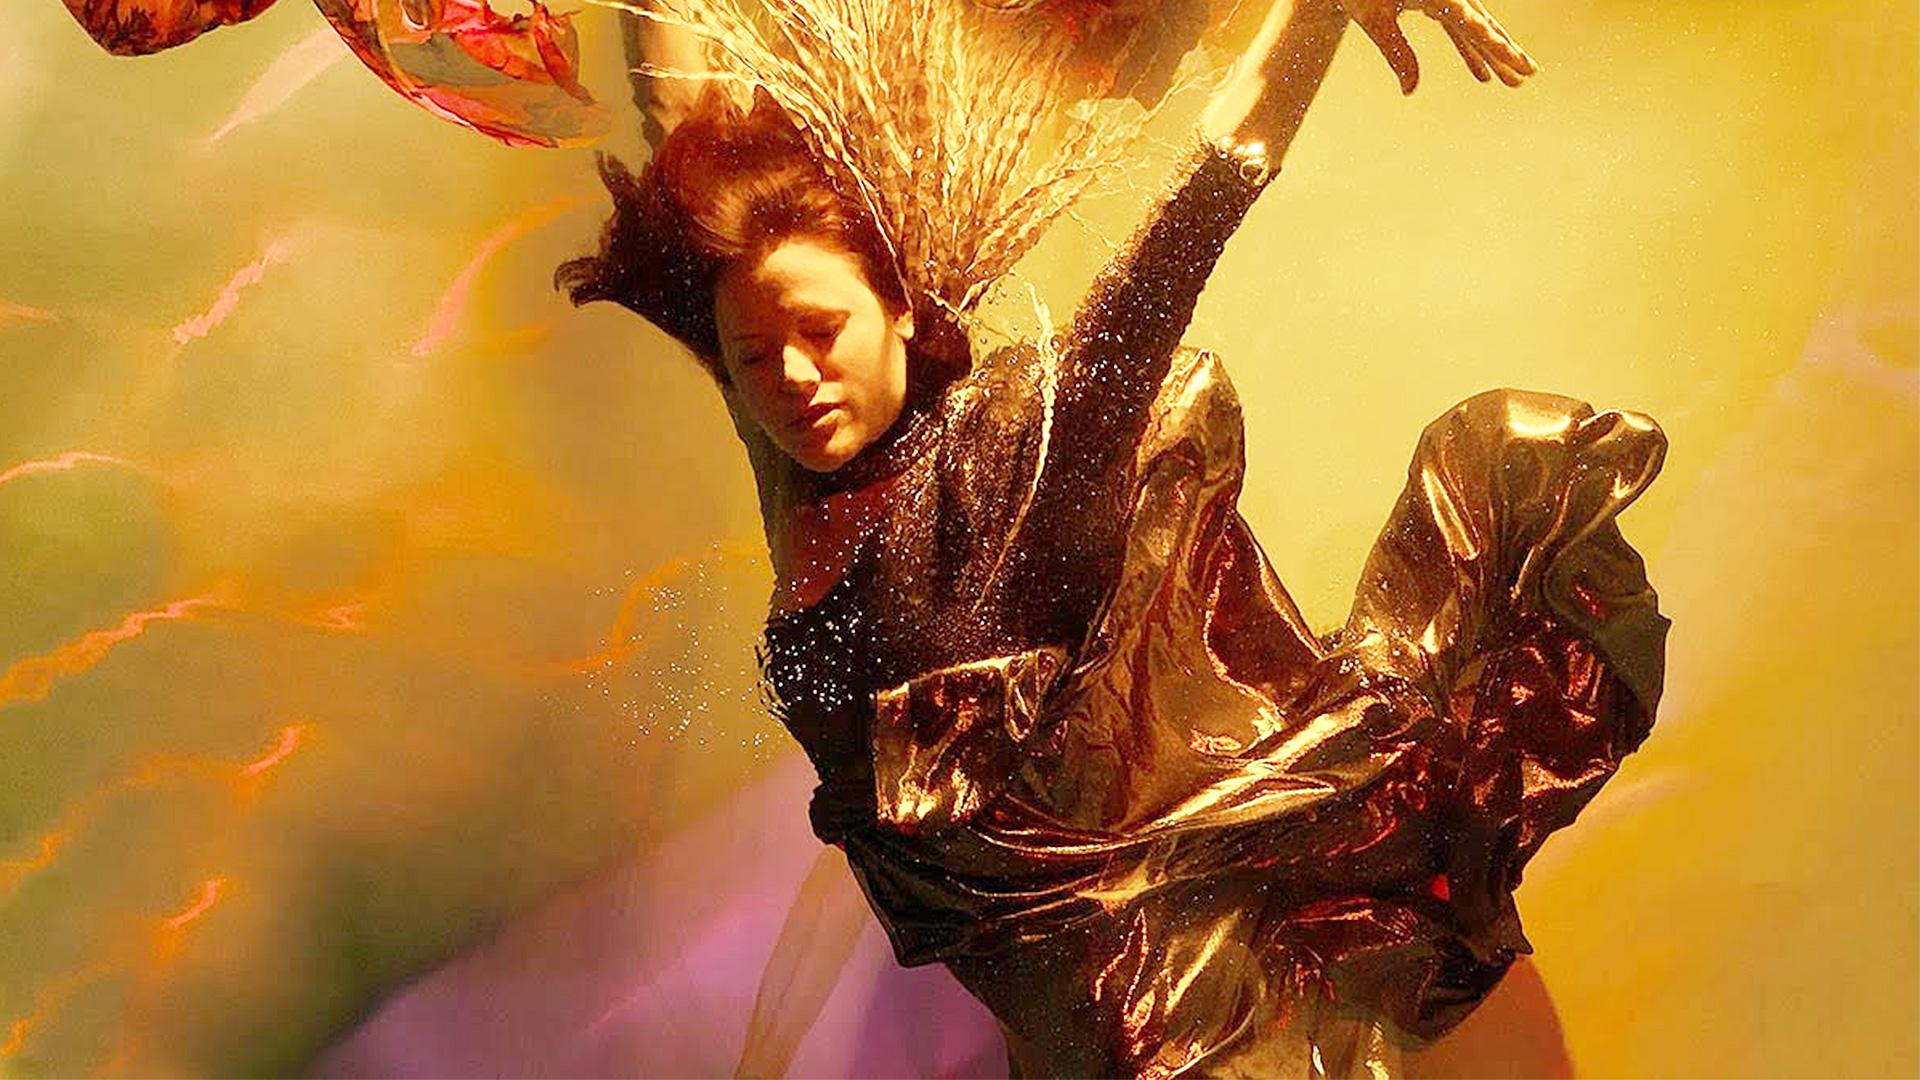 Море, танец и барокко на фотографиях Кристи Ли Роджерс